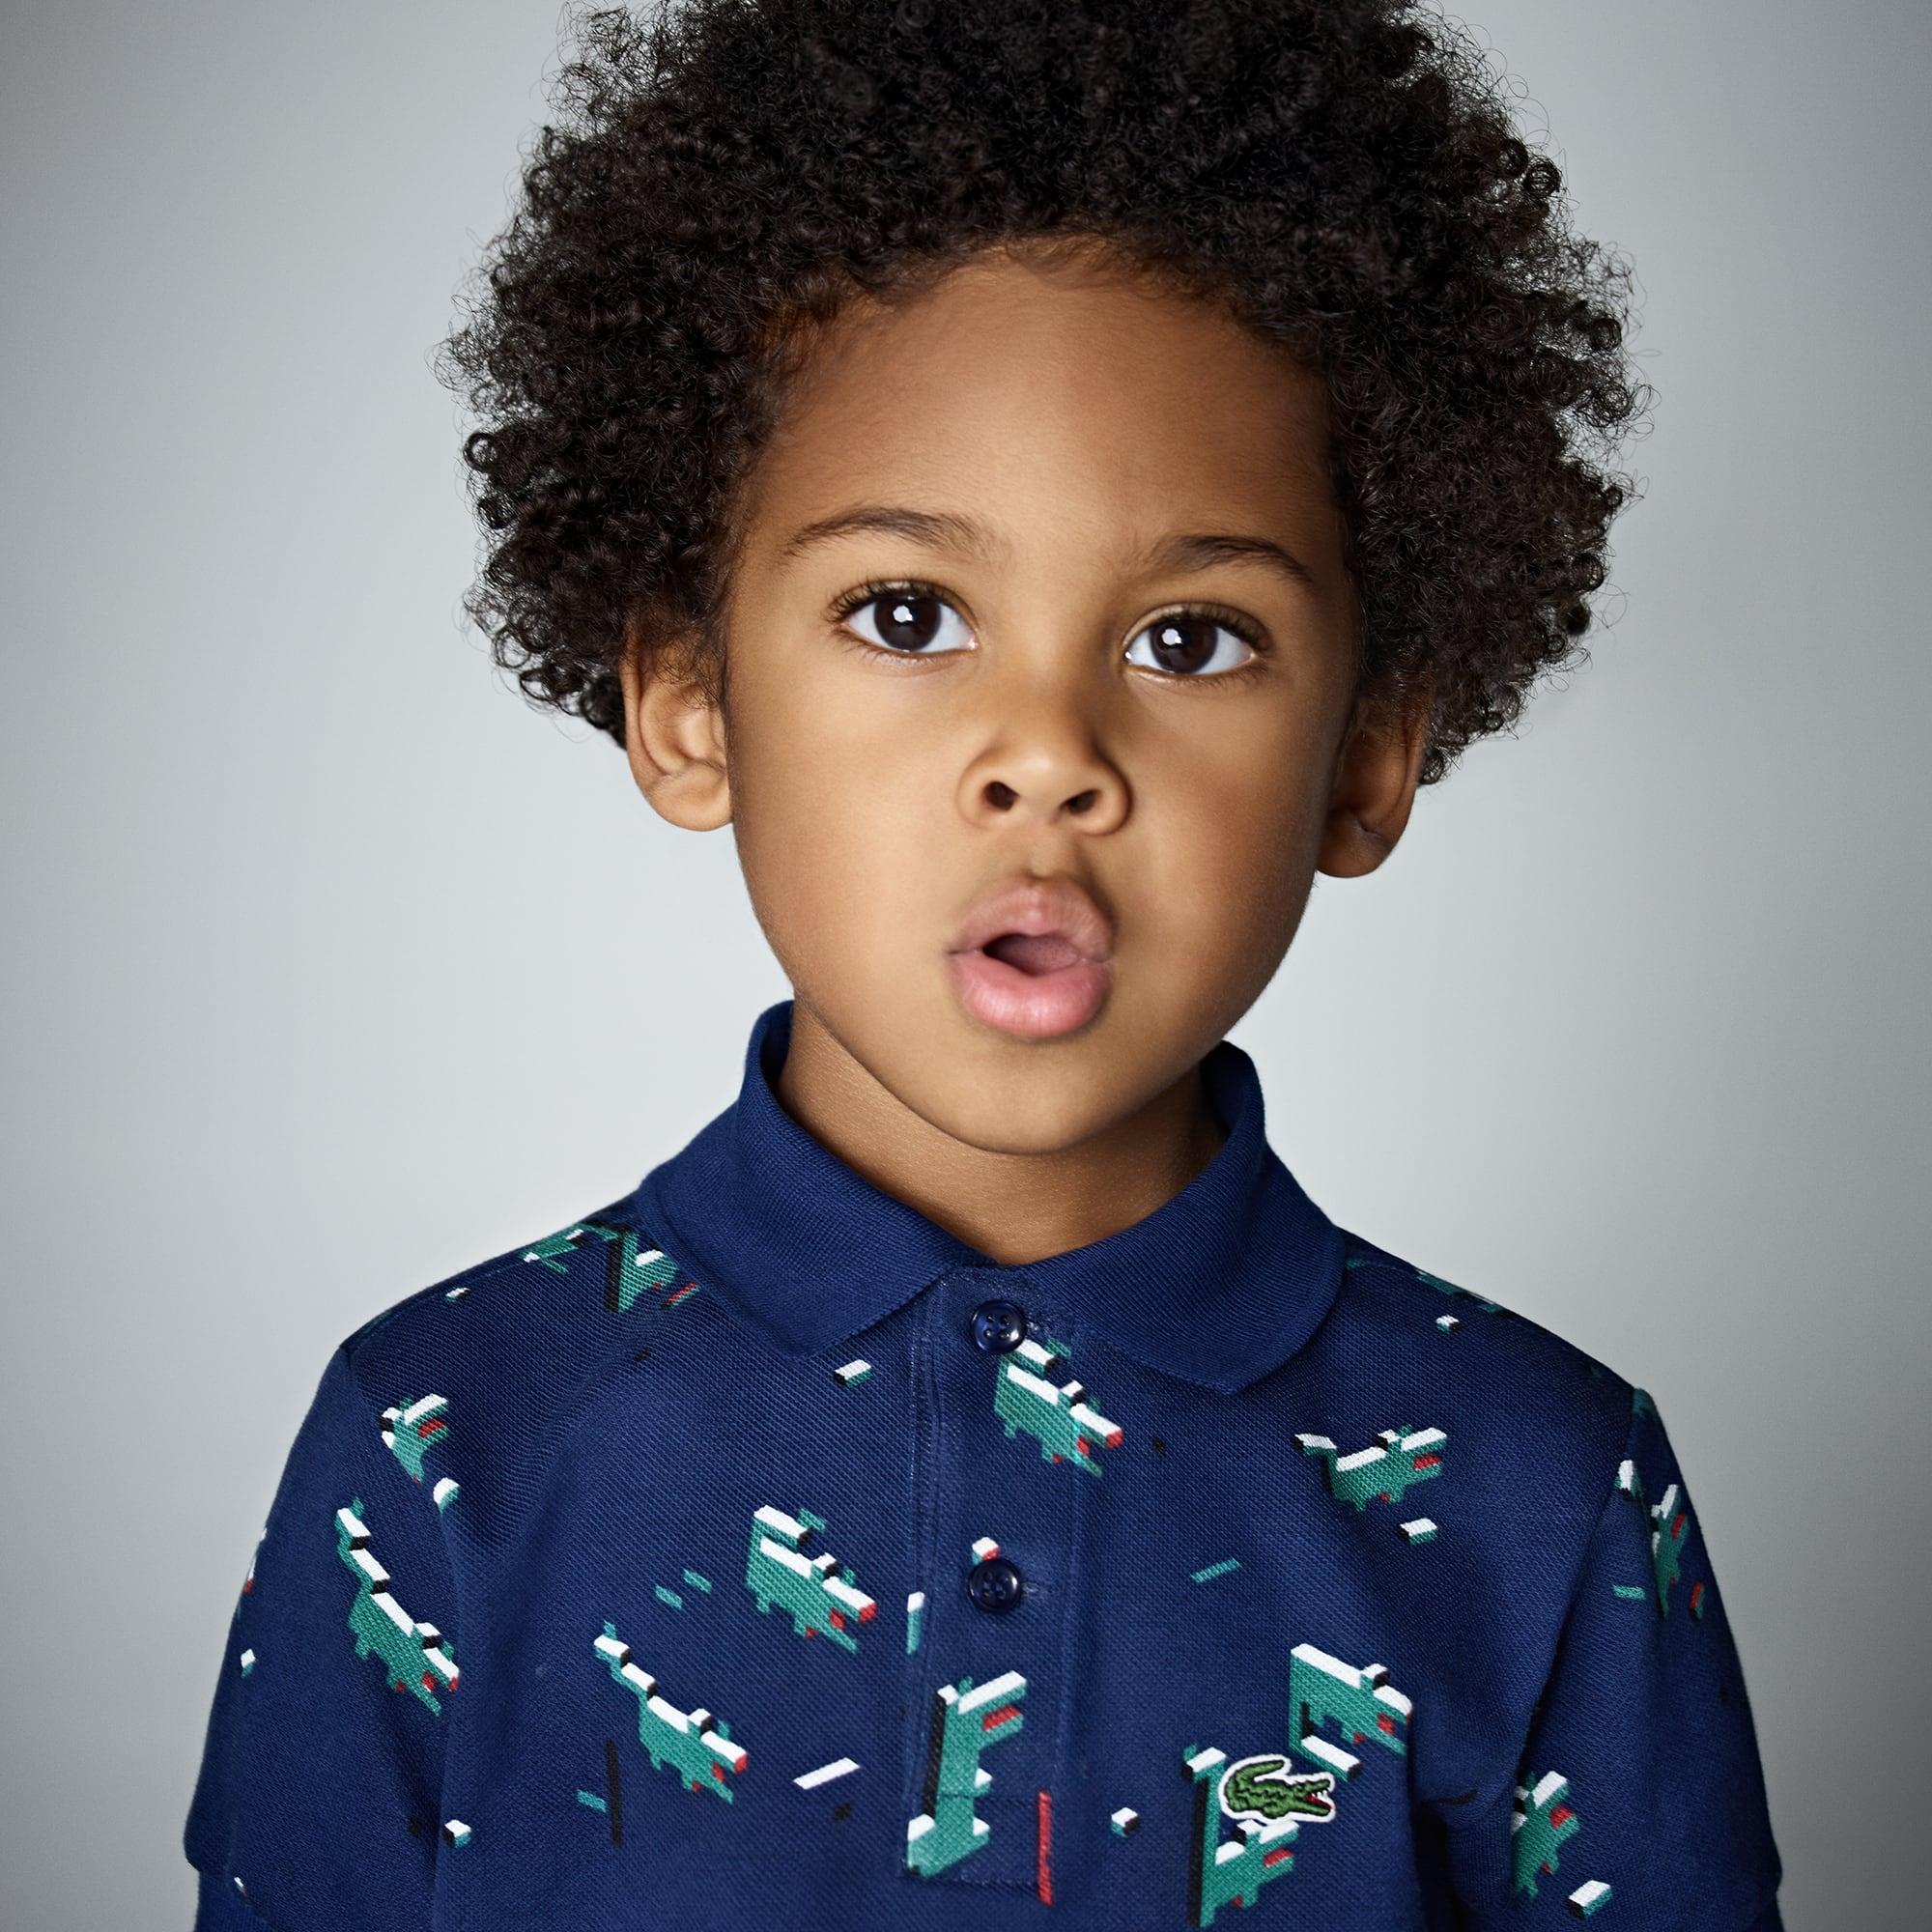 Polo Menino Lacoste em mini piqué impressão Edition Little Boy